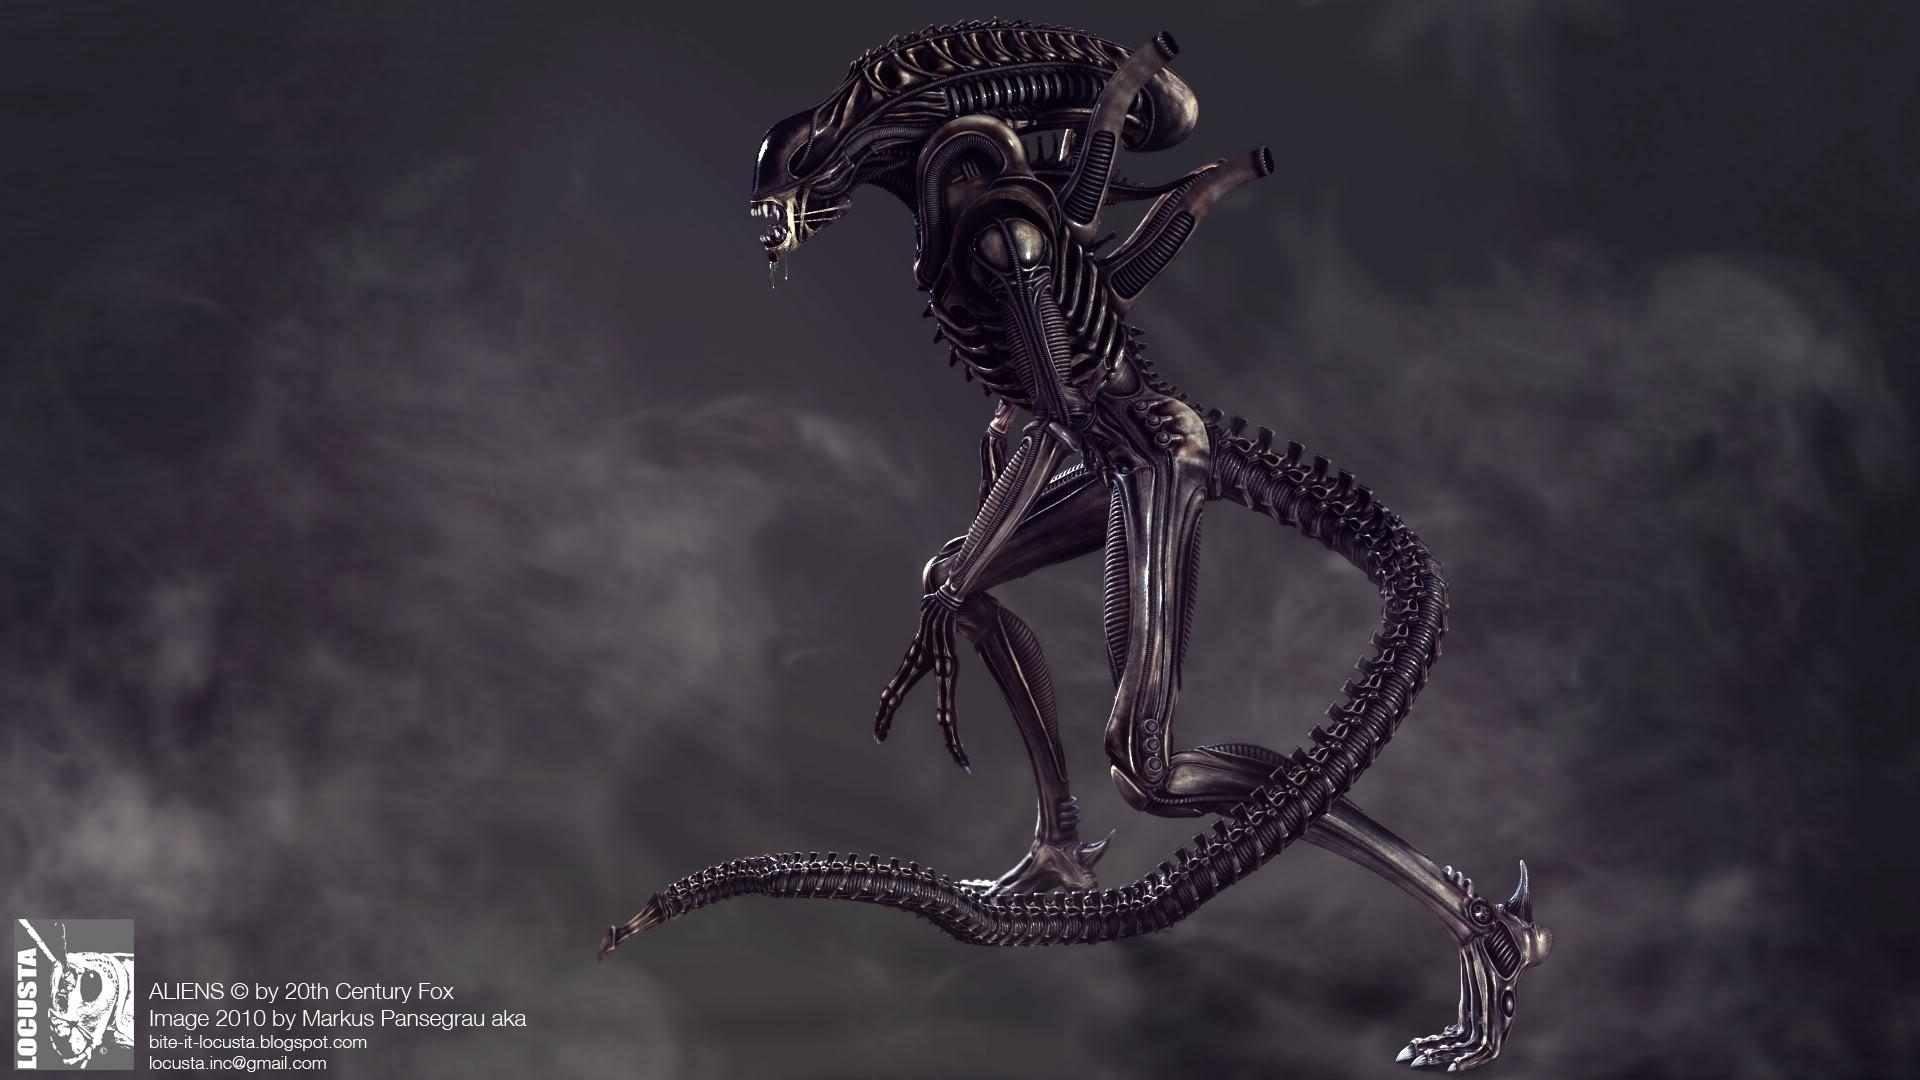 Alien Vs Predator  Full Movie Movies